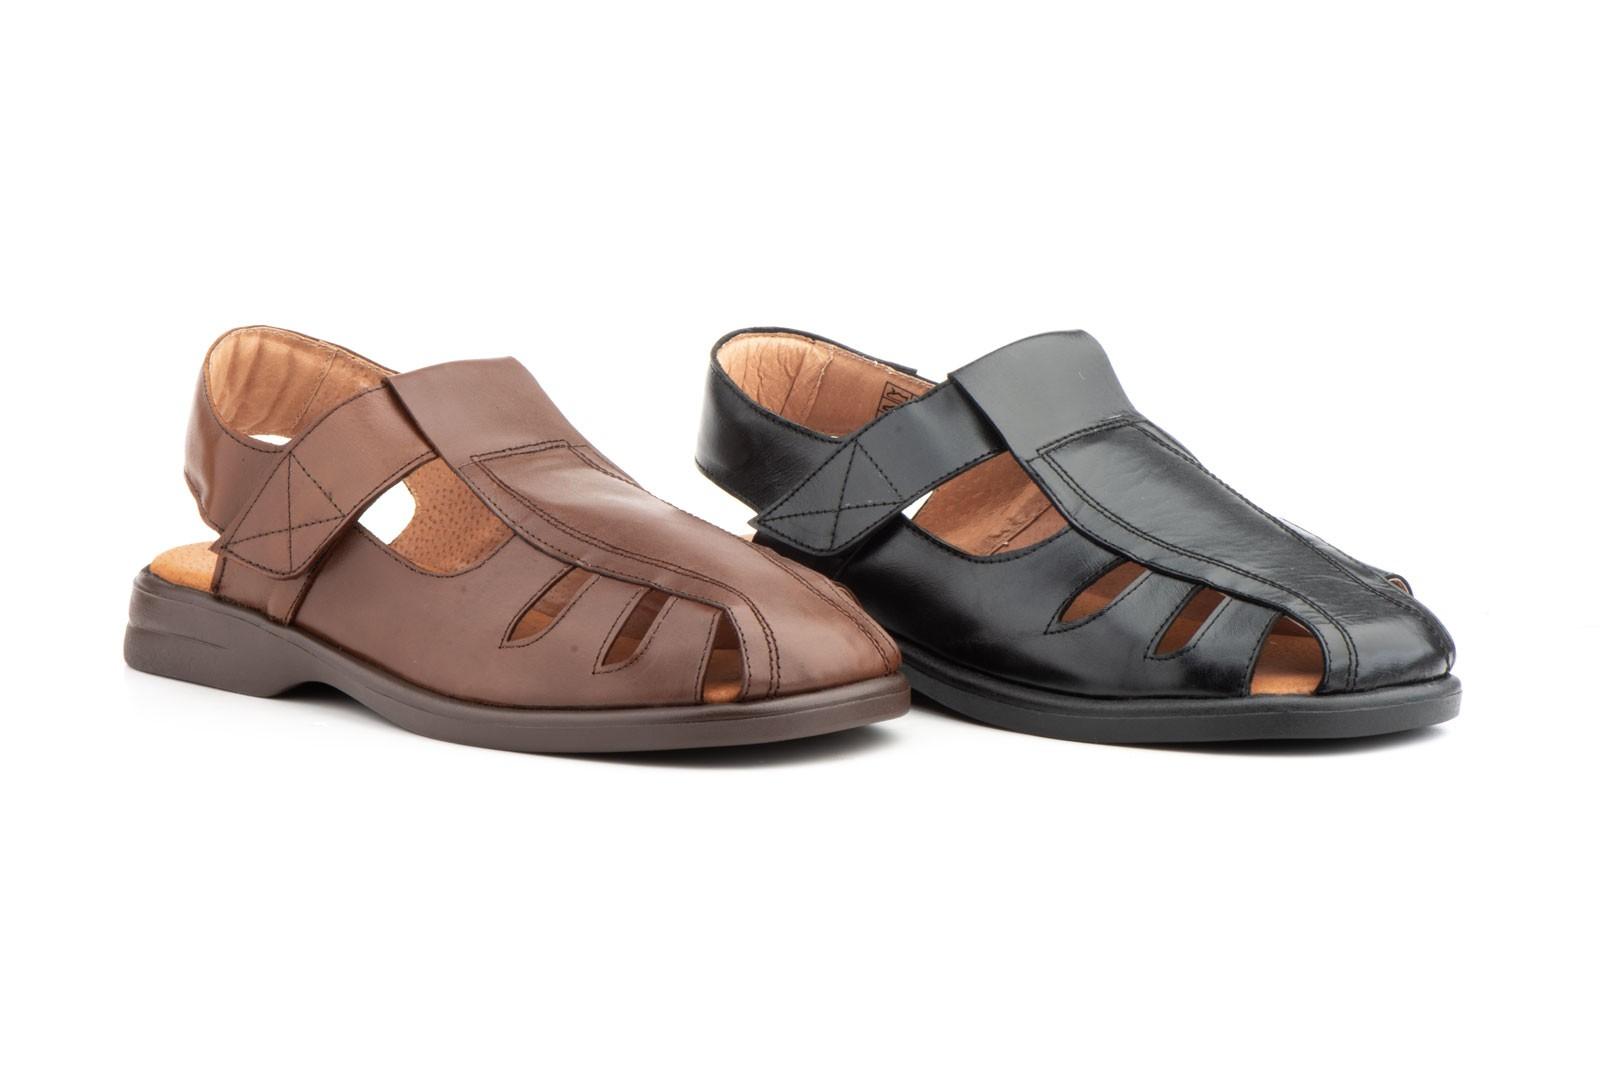 1f6d9bbcfc8 Men s Sandals Black Leather Type Velcro Good Ibérico IBERICO-140939